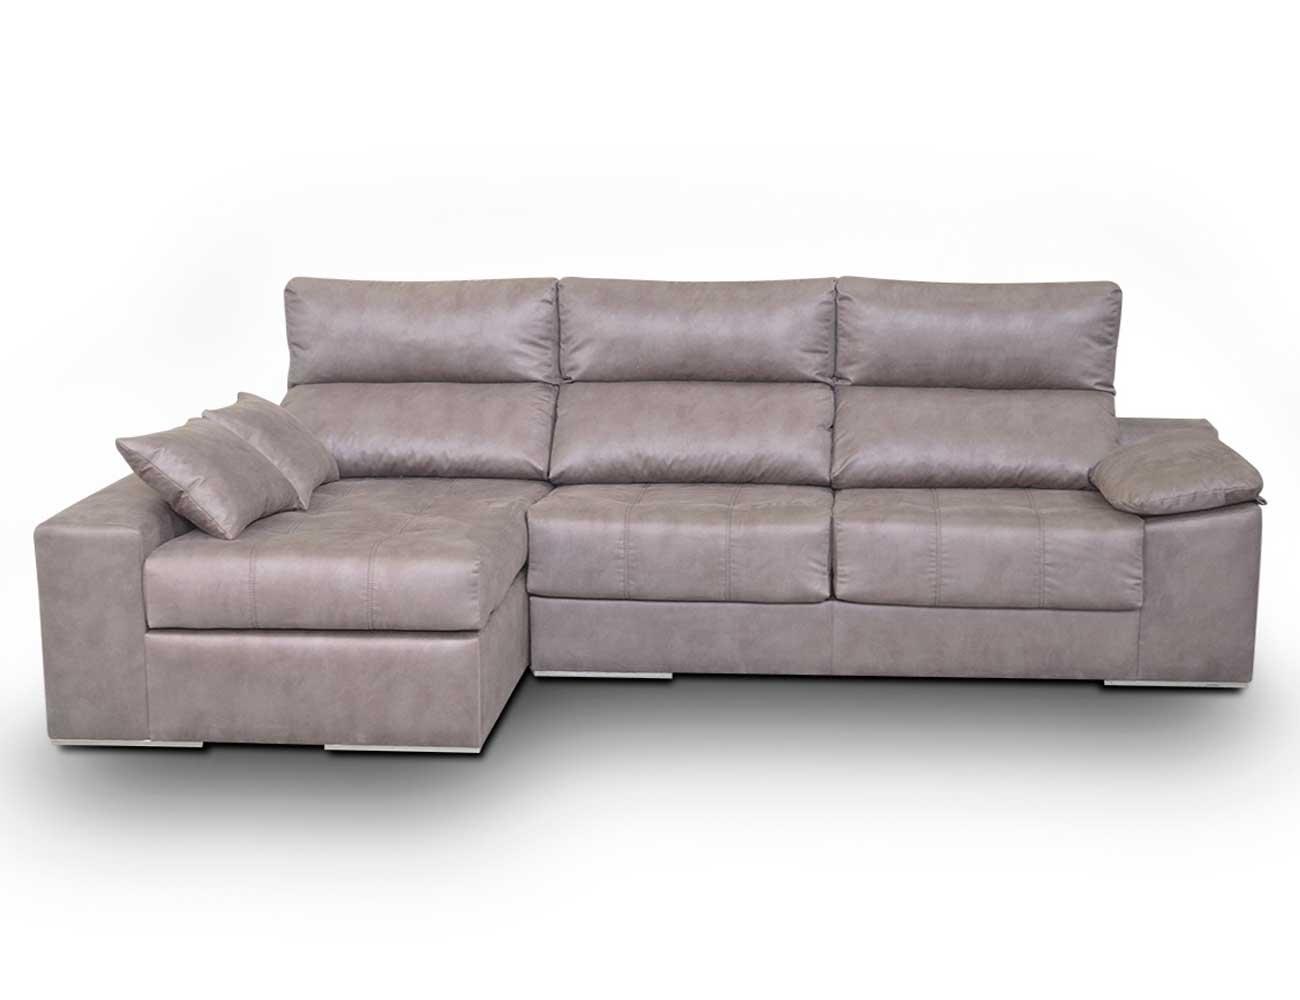 4938_sofa chaiselongue moderno asientos extraibles muy comodo dobles pespuntes donatella7